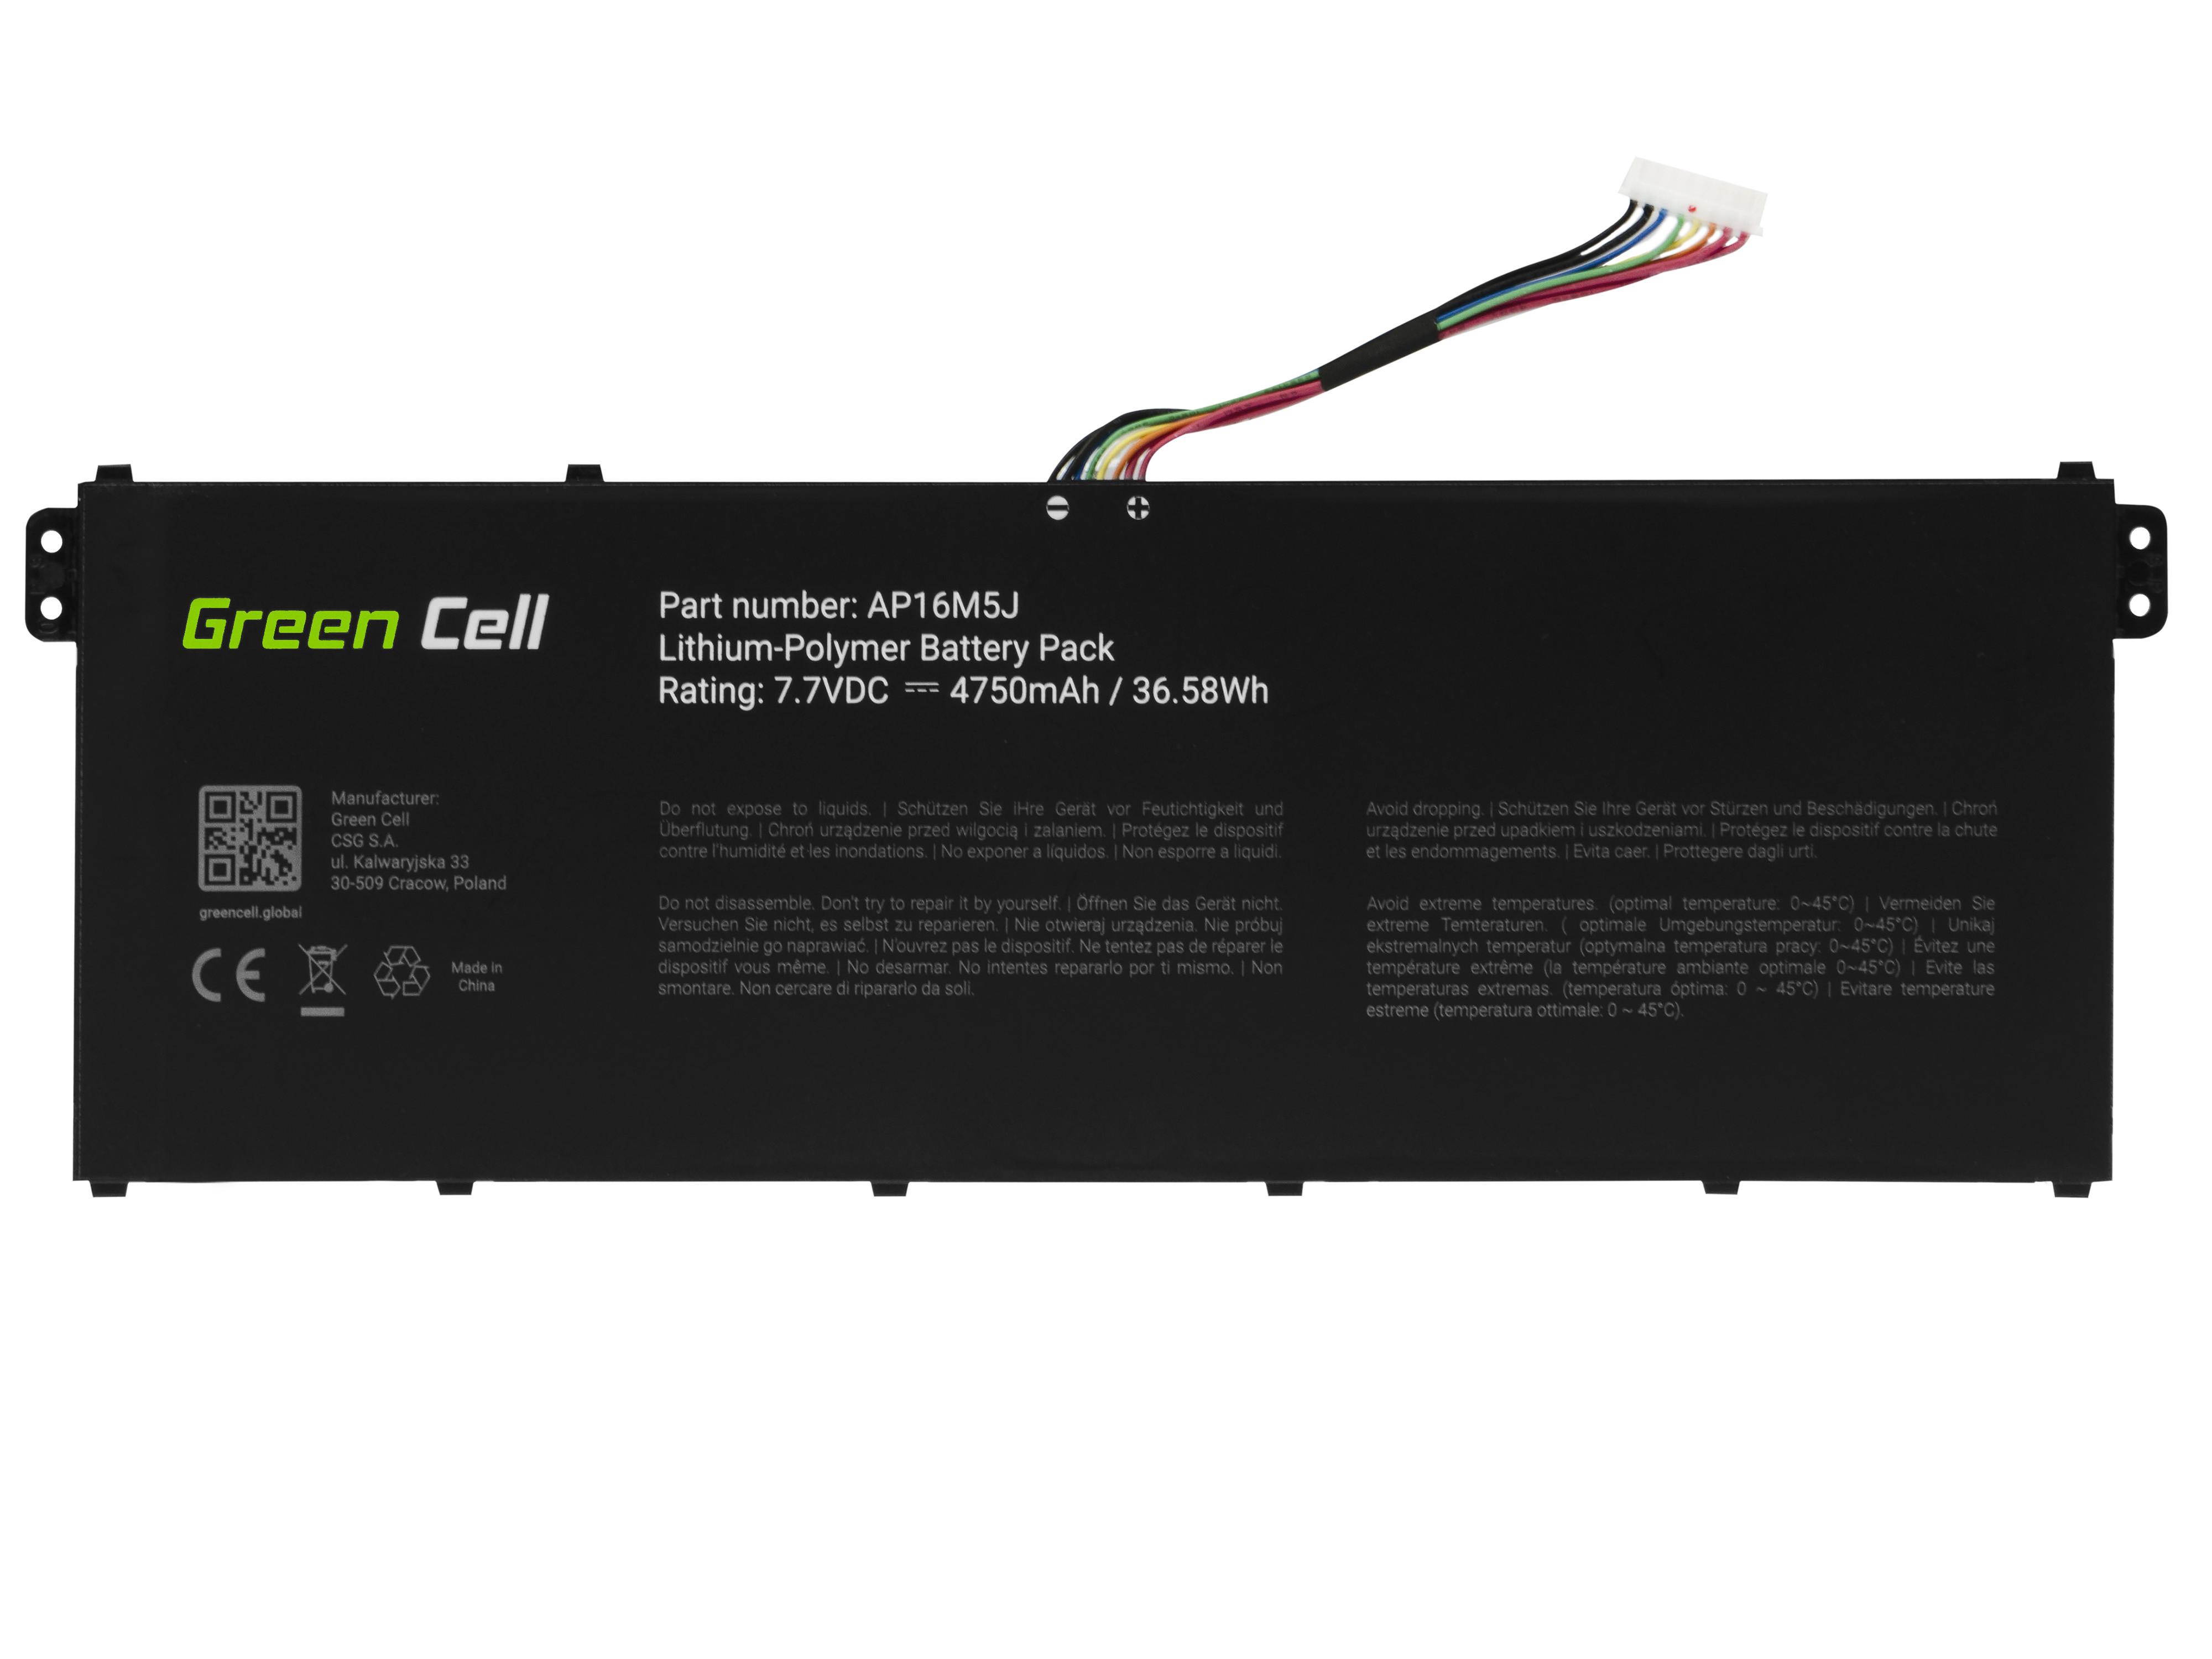 Green Cell AC73 Baterie Acer AP16M5J Acer Aspire 3 A315 A315-31 A315-42 A315-51 A317-51 Aspire 1 A114-31 4750mAh Li-Pol – neoriginální